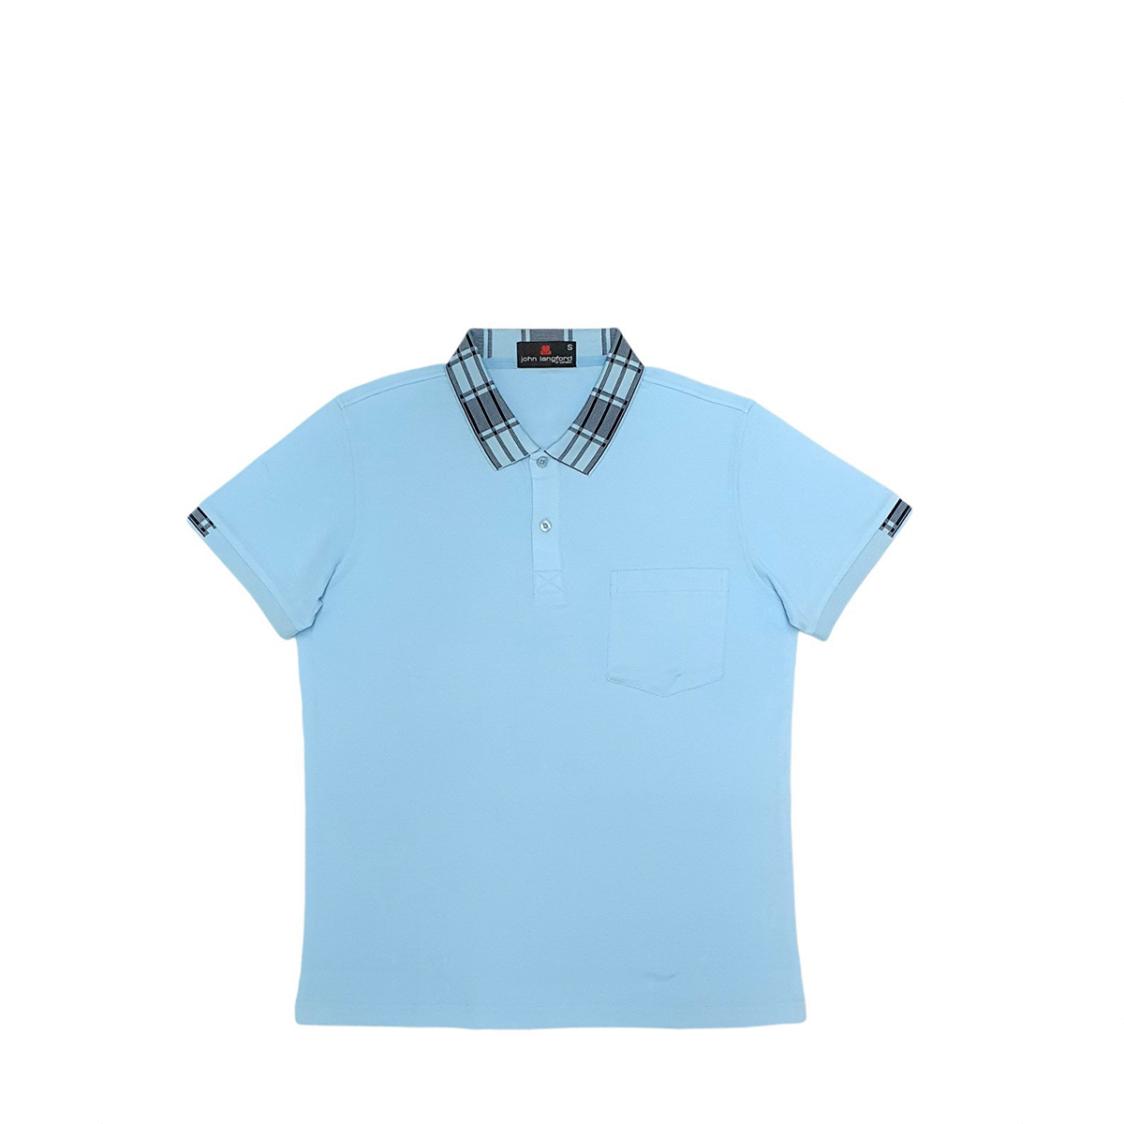 John Langford Honeycombed Polo T-Shirt with Pocket and Digital Printed Collar Blue